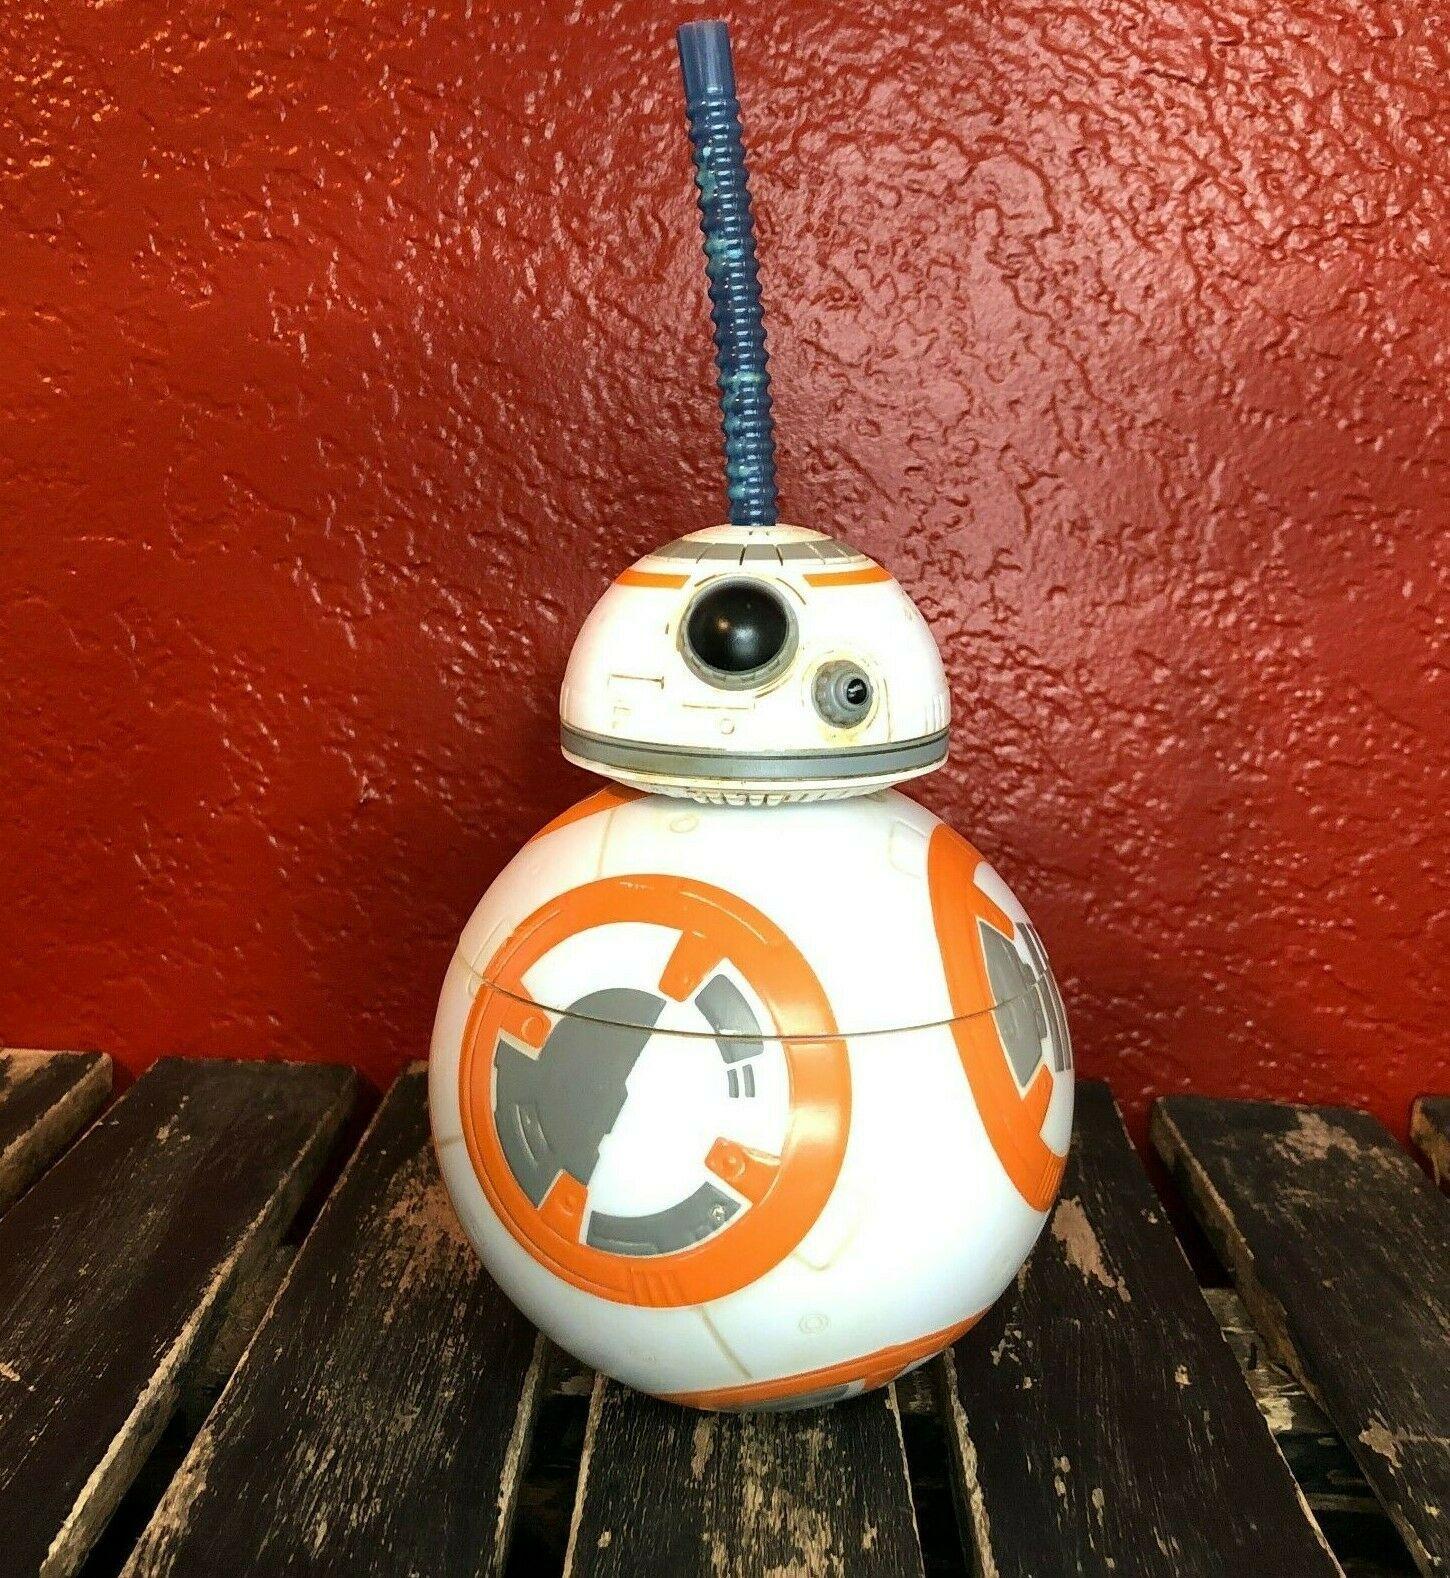 Disney Parks Star Wars BB-8 Souvenir Cup Straw Exclusive Collectible Disneyana - $13.67